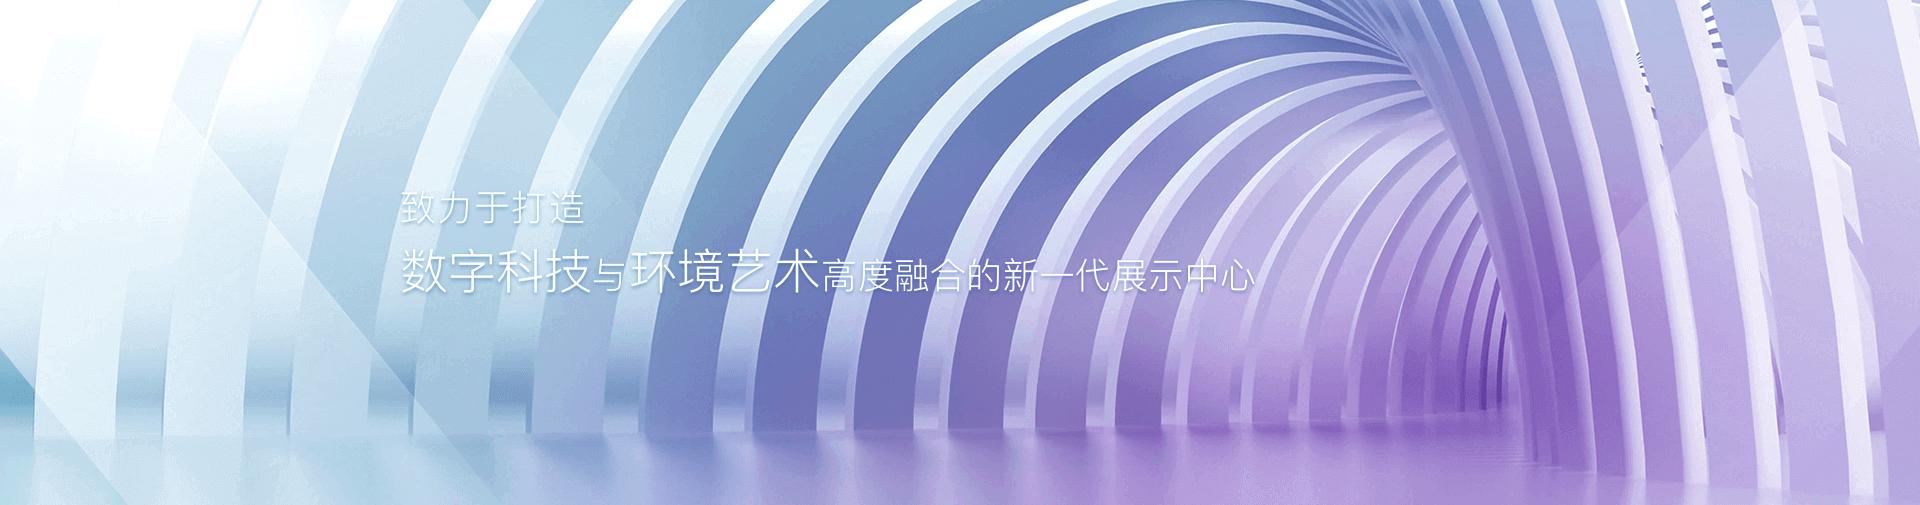 banner1.518a1fa